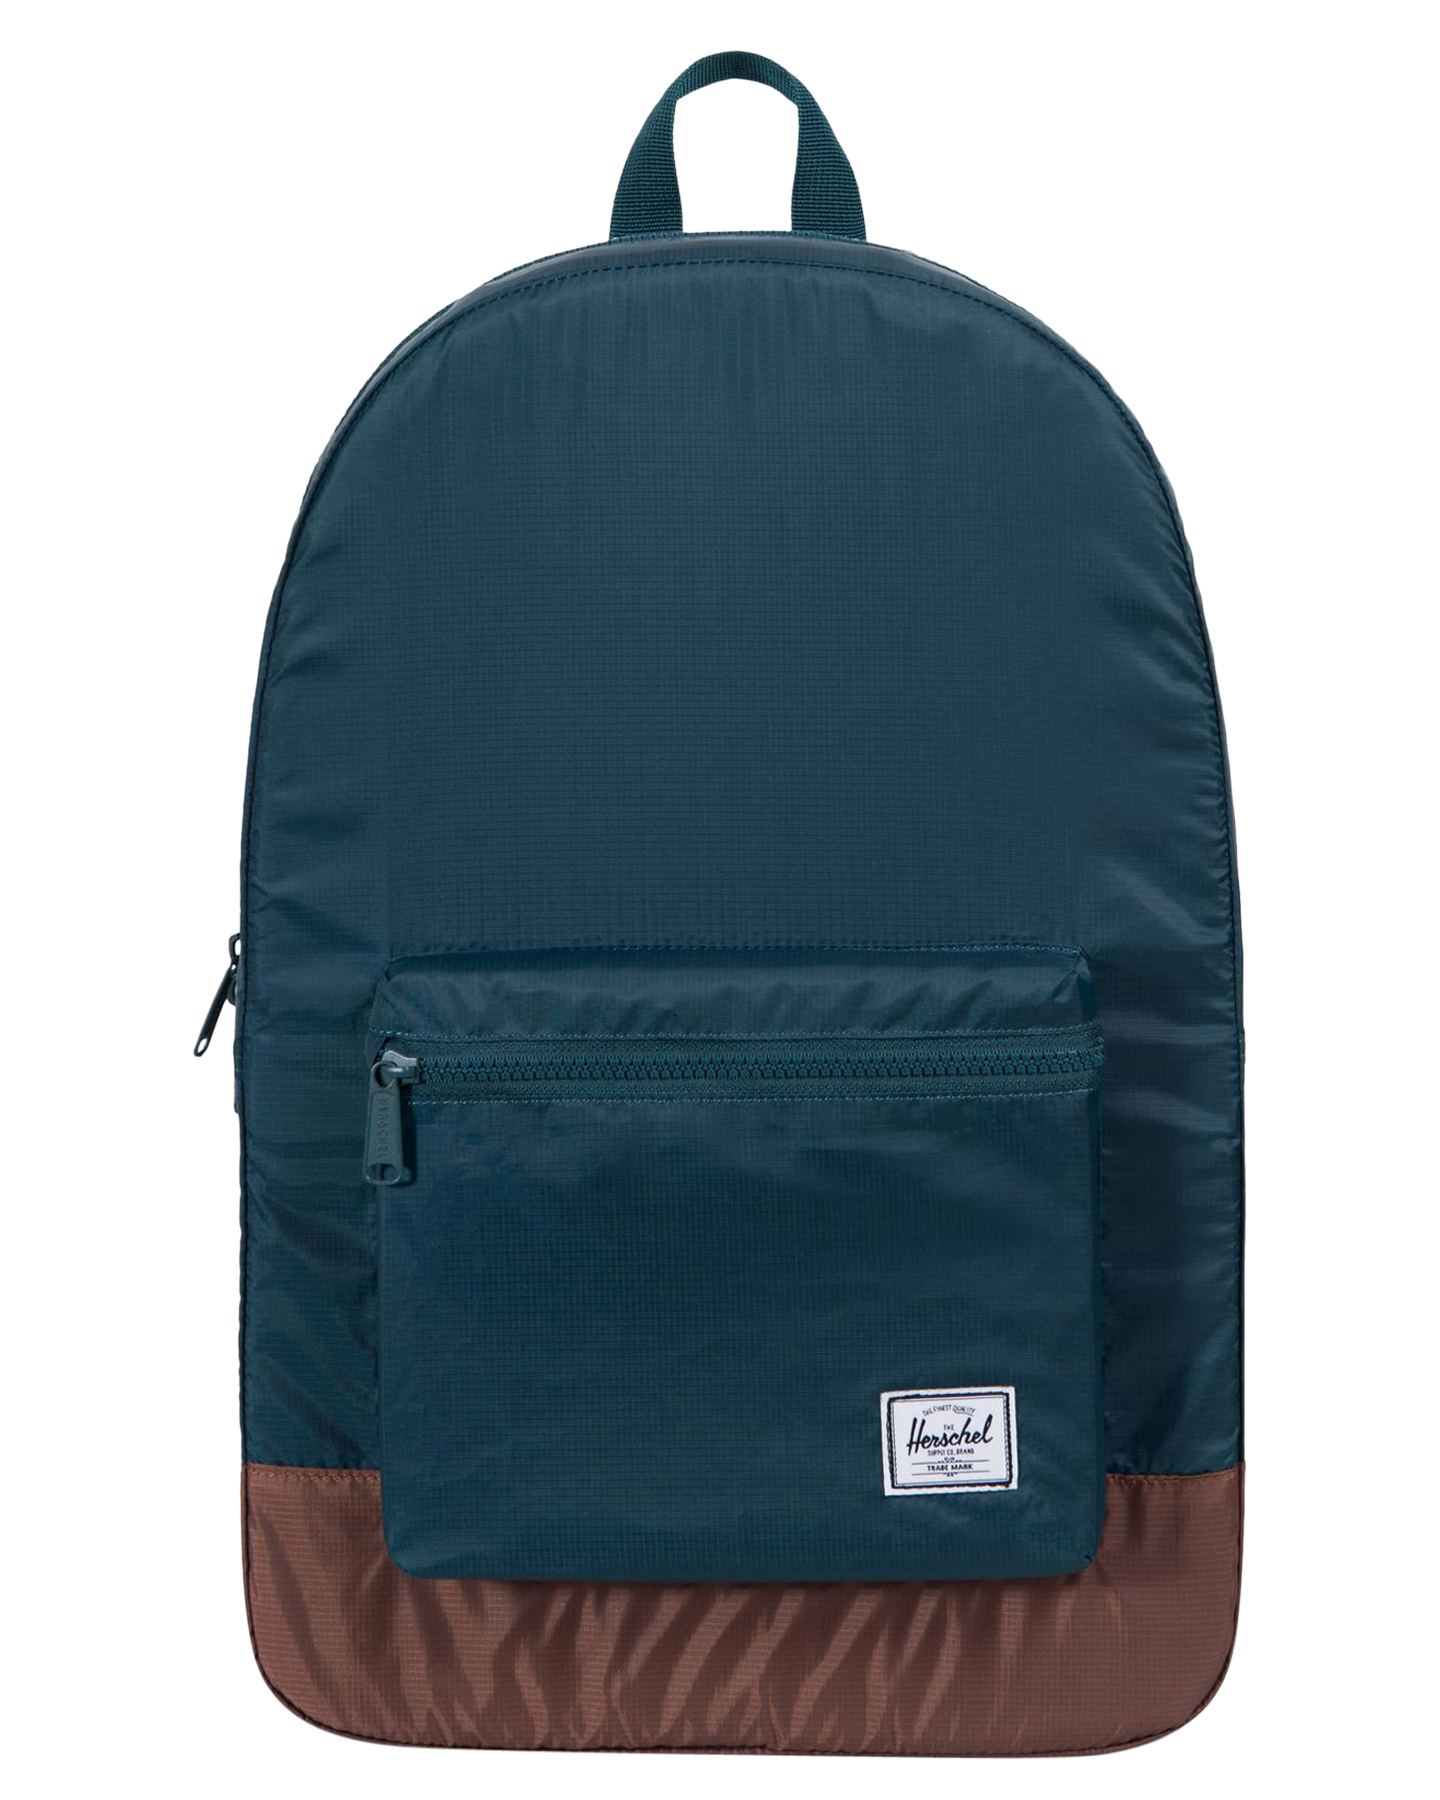 4c7beca3fcce Herschel Supply Co Men  039 s Packable 24L Daypack Plastic Polyester ...